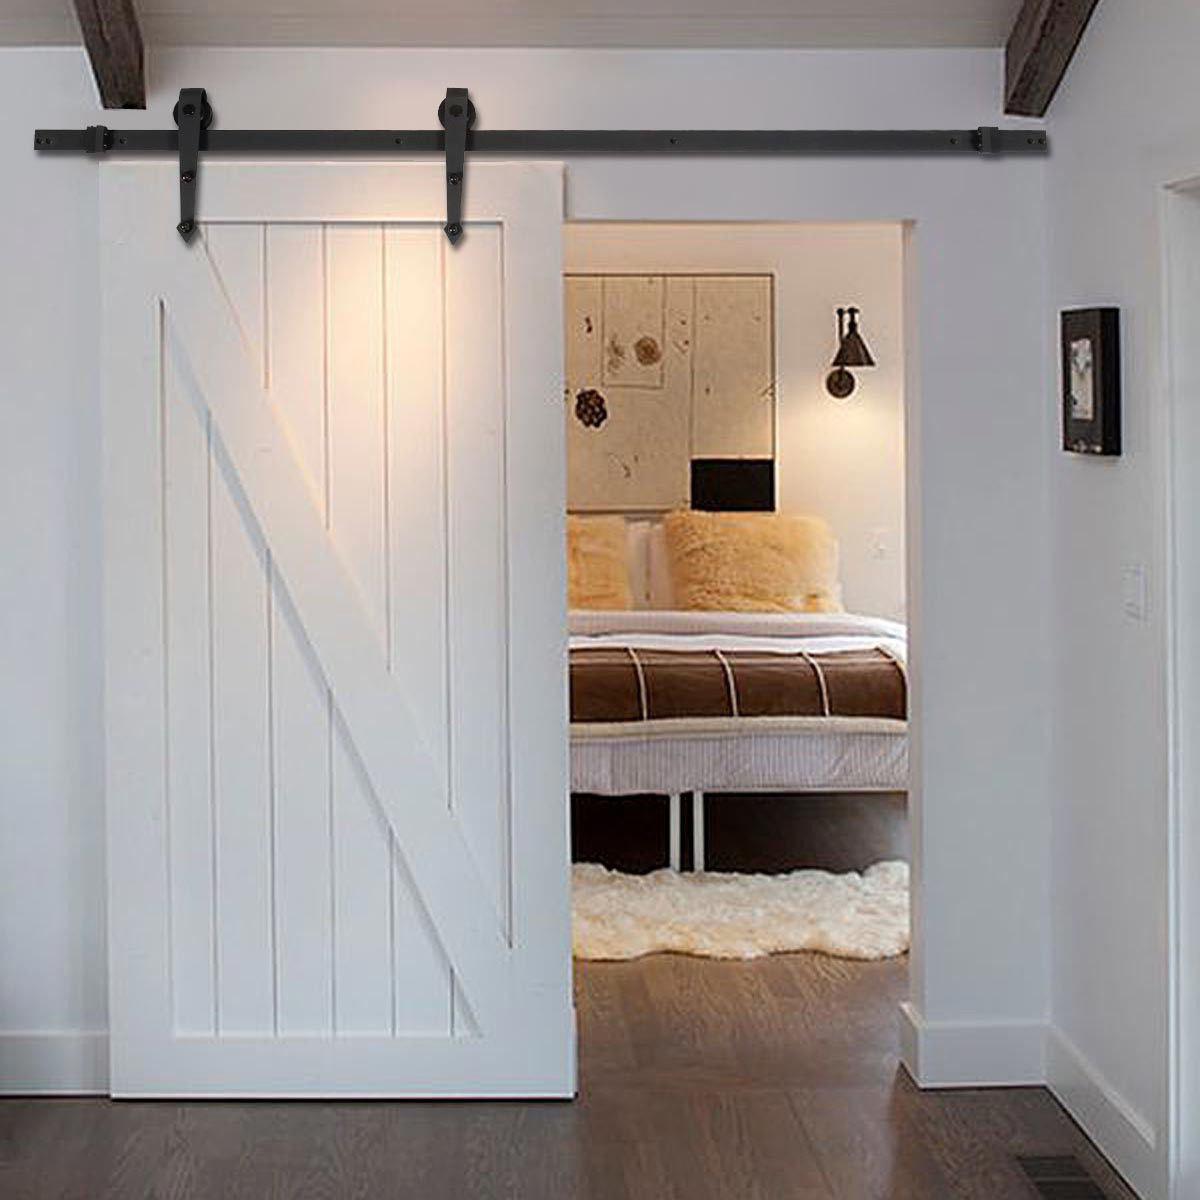 Picture of Sliding Barn Wood Door Hardware Modern Antique Style 6 FT Black